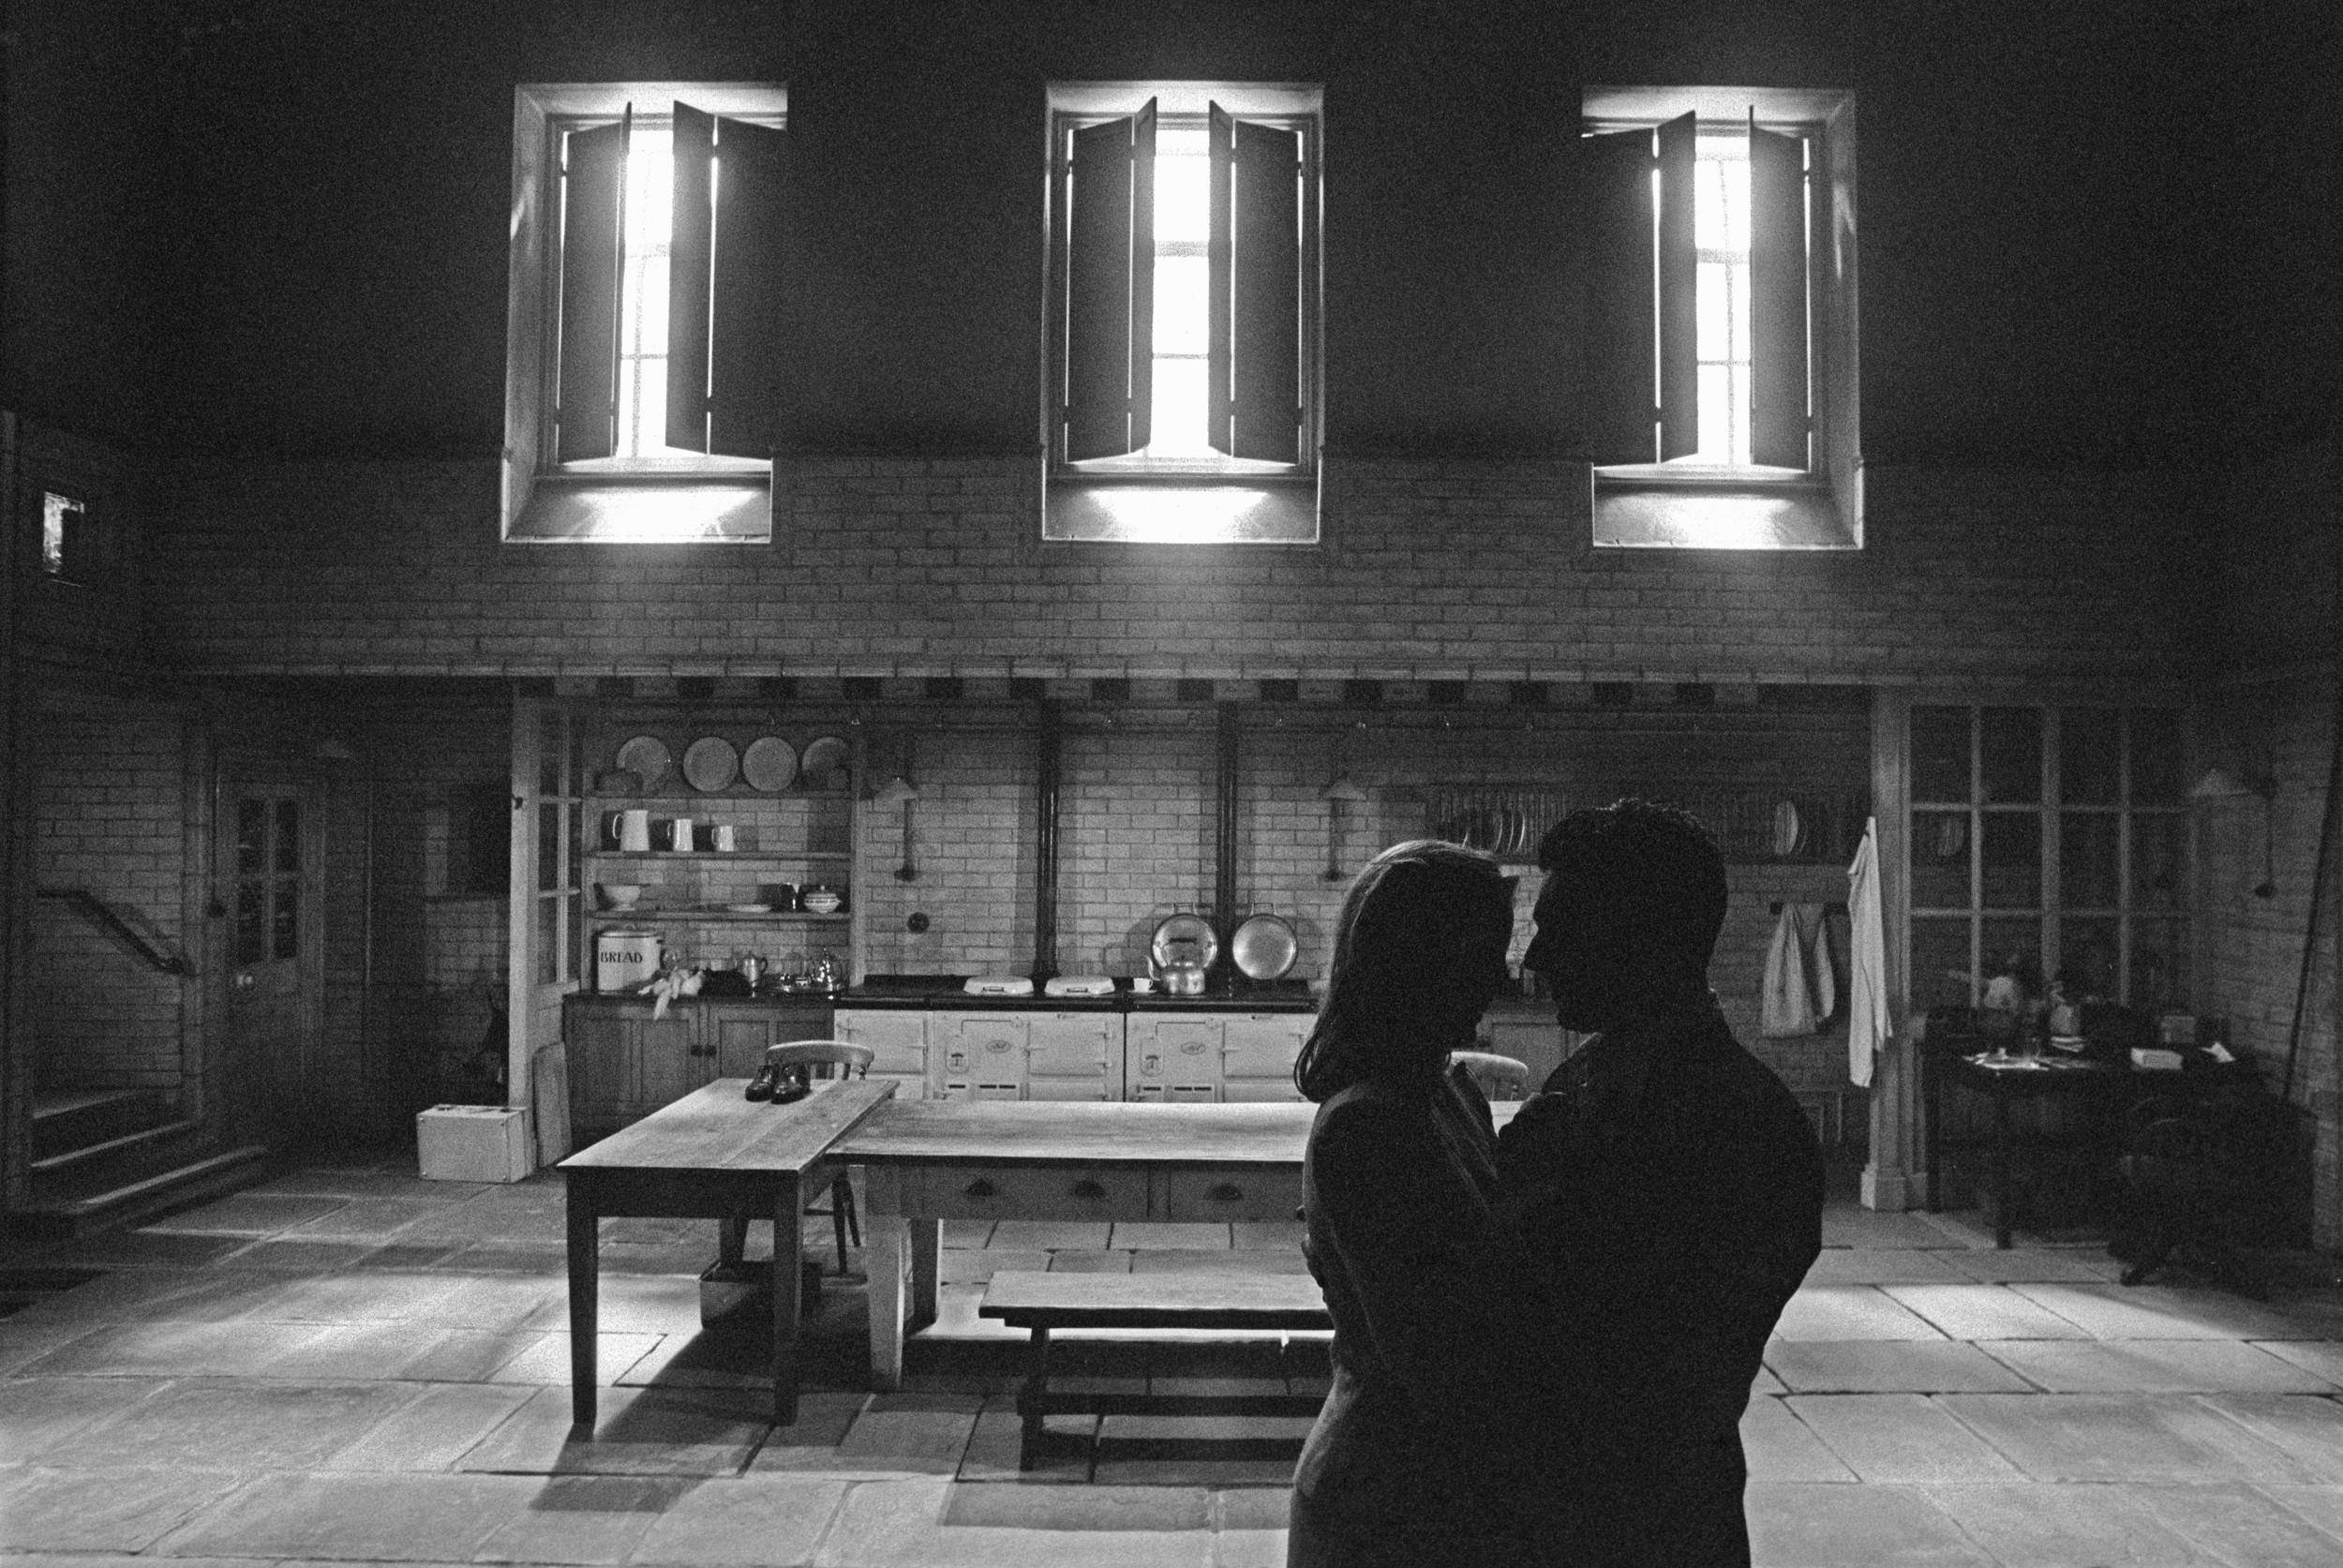 After Miss Julie-Donmar Warehouse 006.jpg